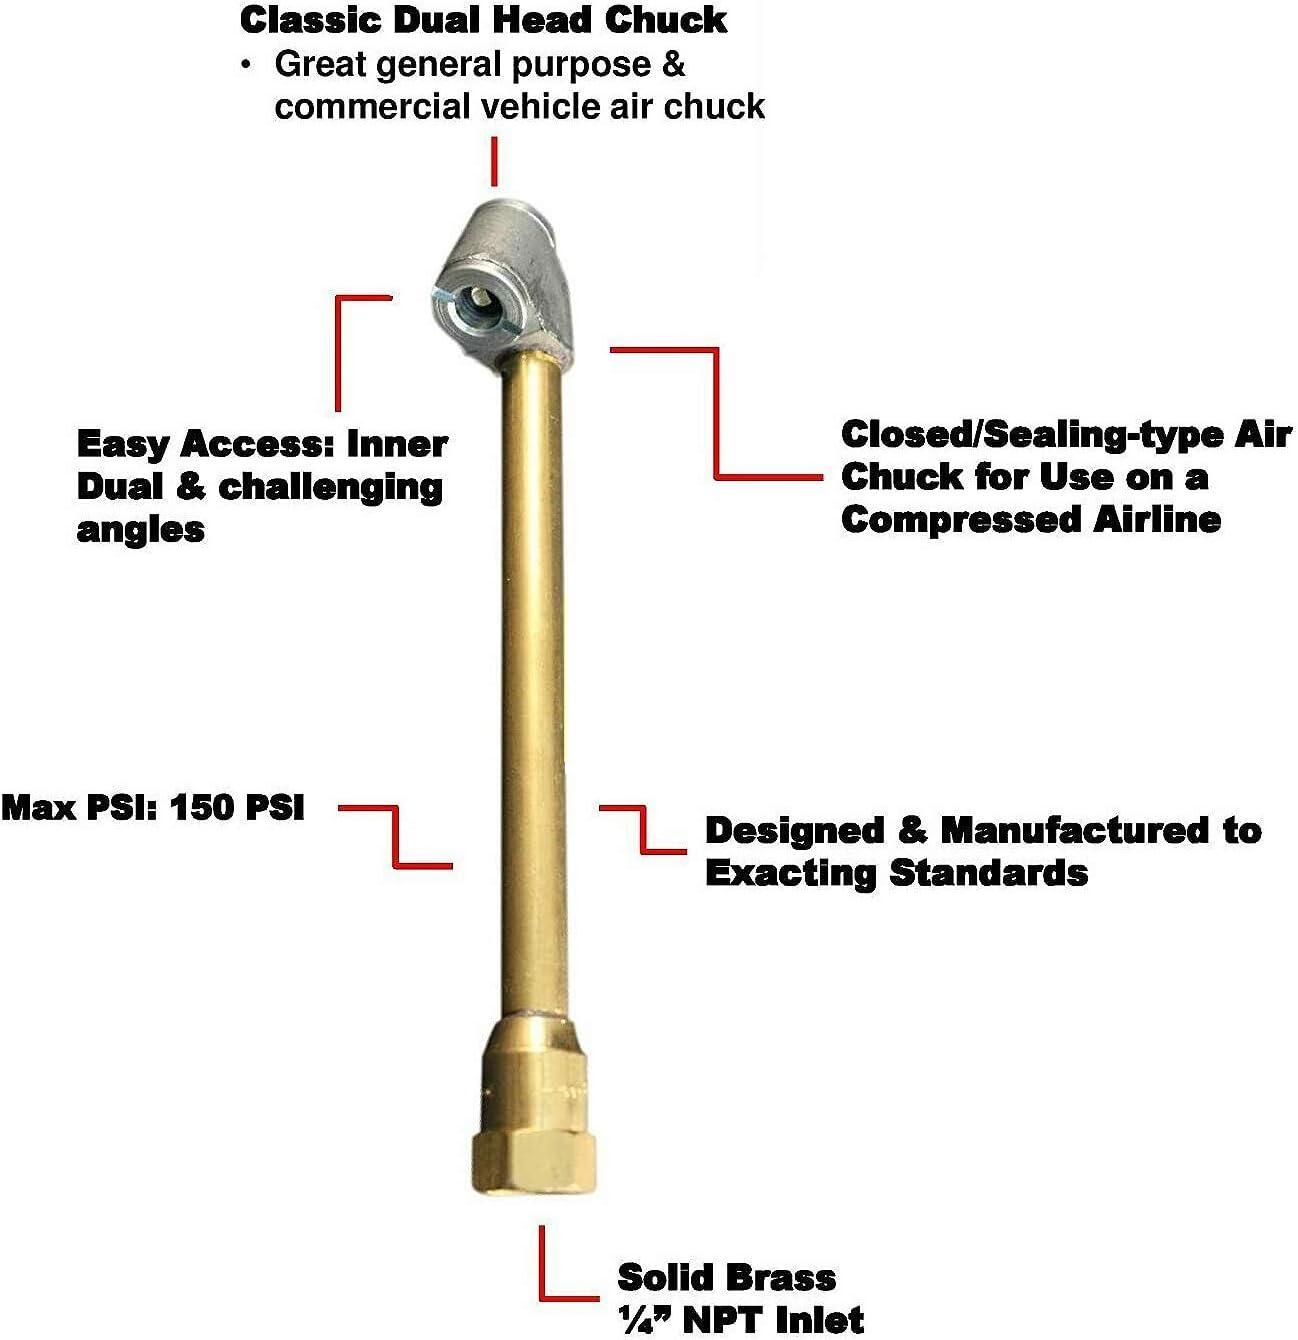 Xigeapg Heavy Duty Brass Air Chuck Set 1//4 Inch FNPT Dual Head Air Chuck 1//4 Inch Closed Ball Air Chuck